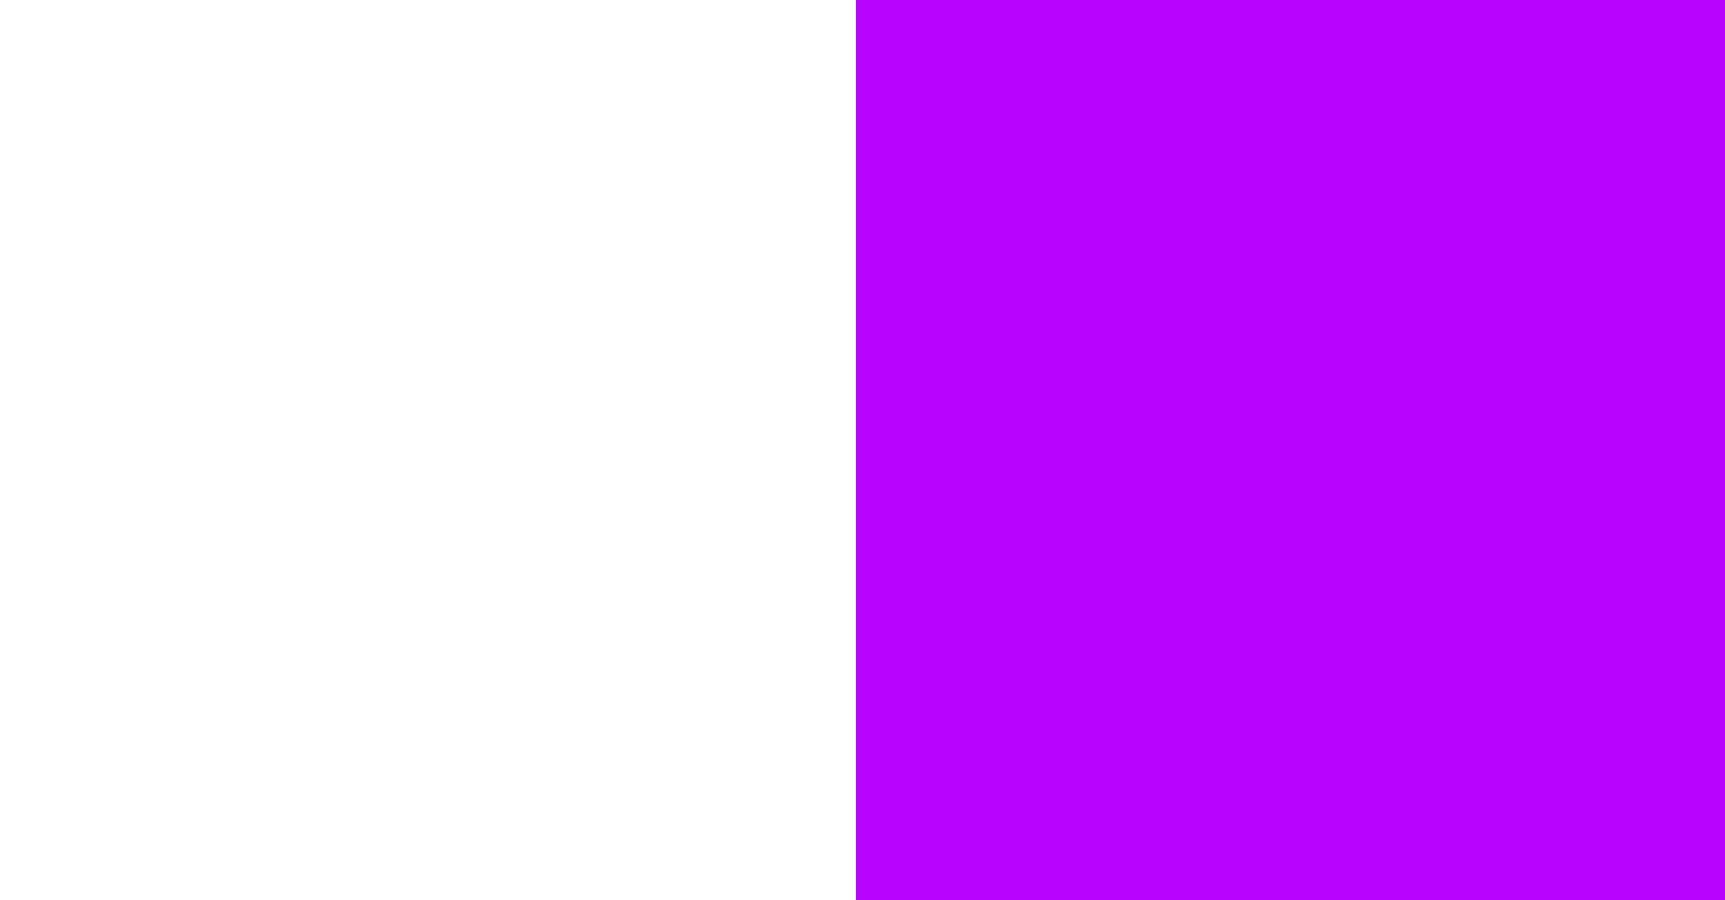 White / violet